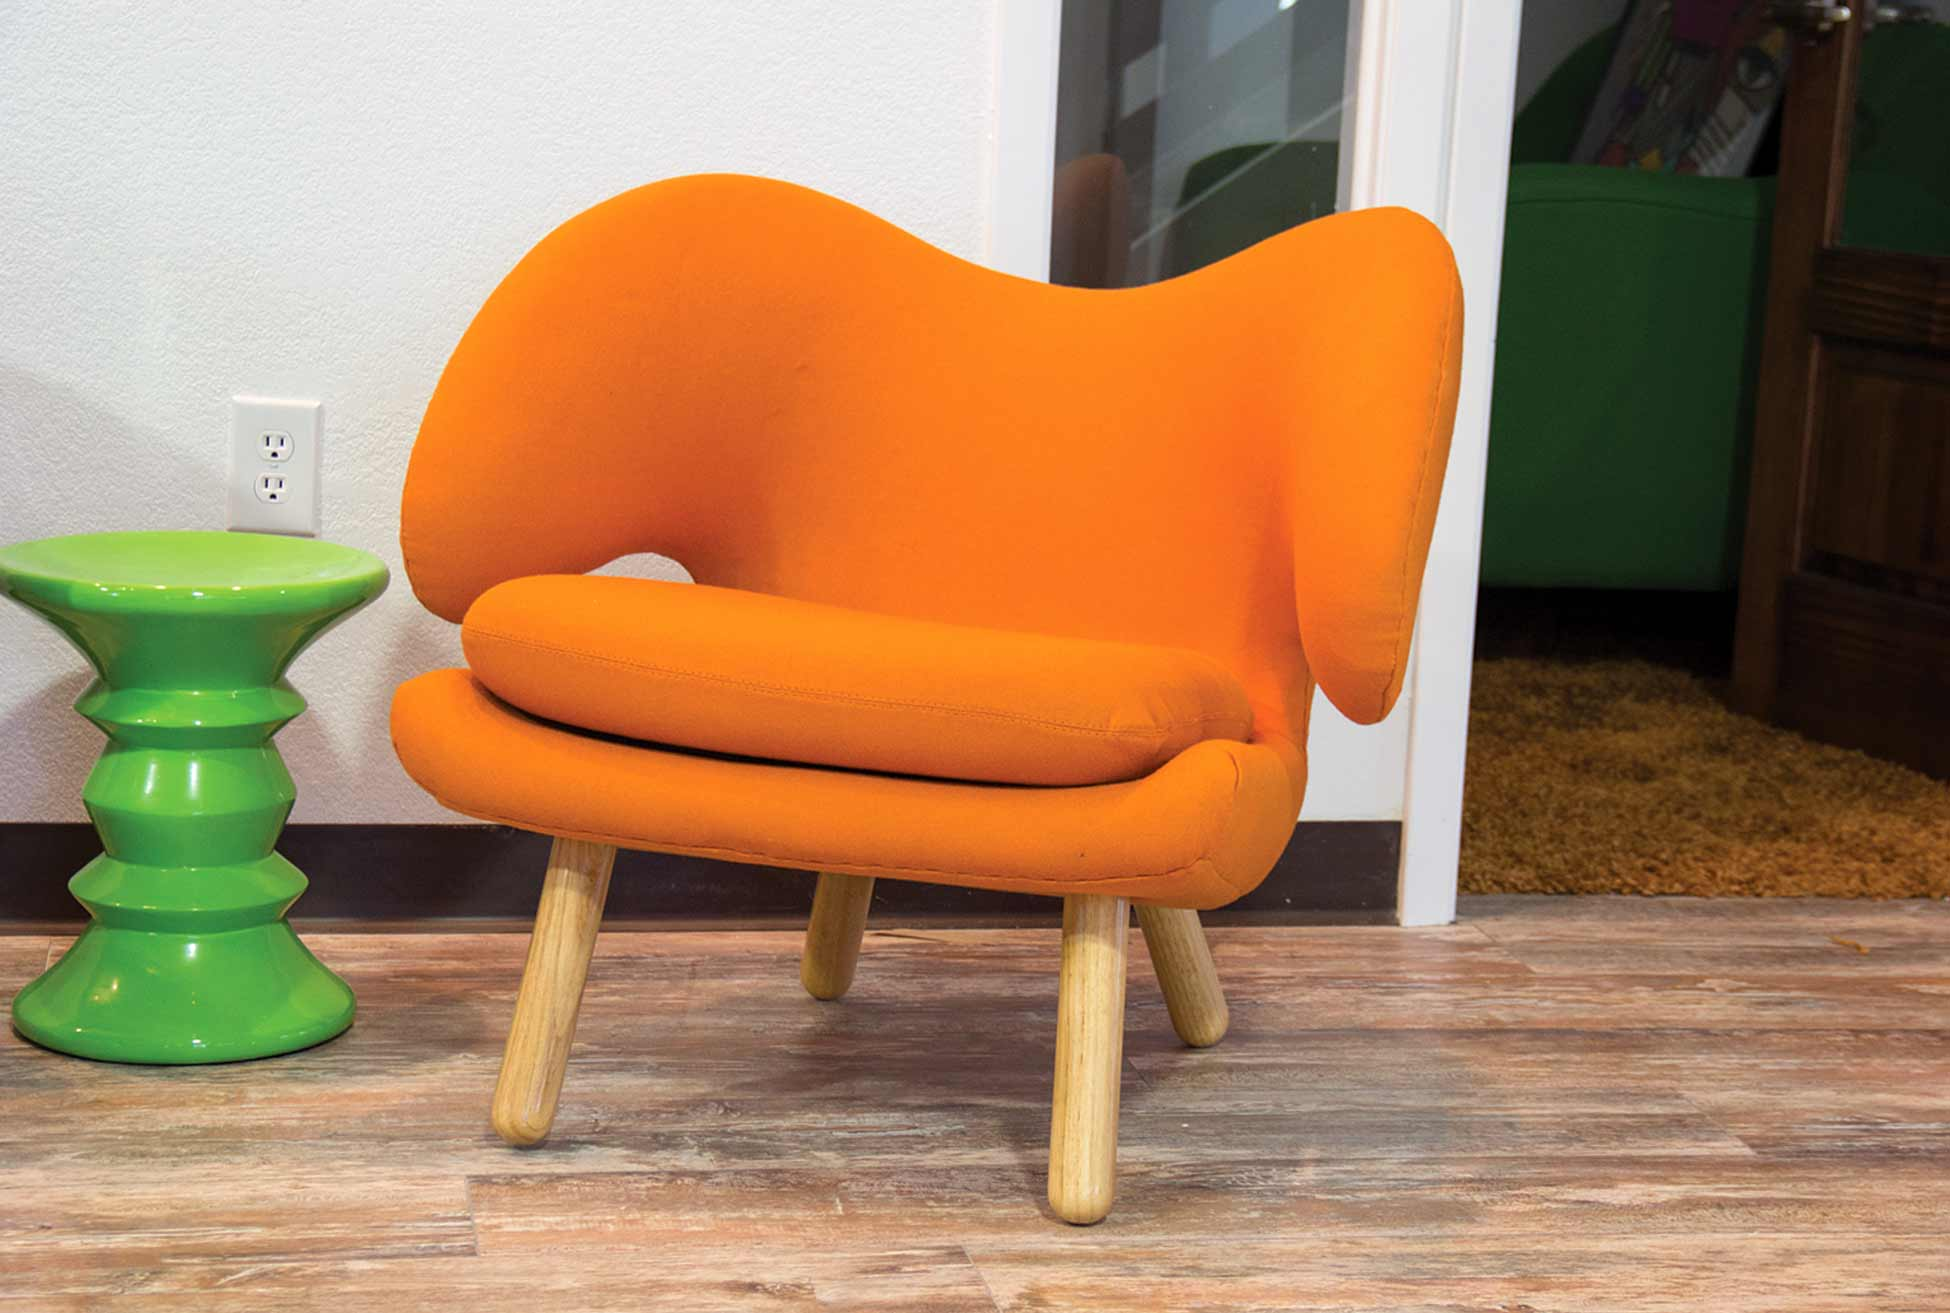 theworklodge_interior-seating.jpg